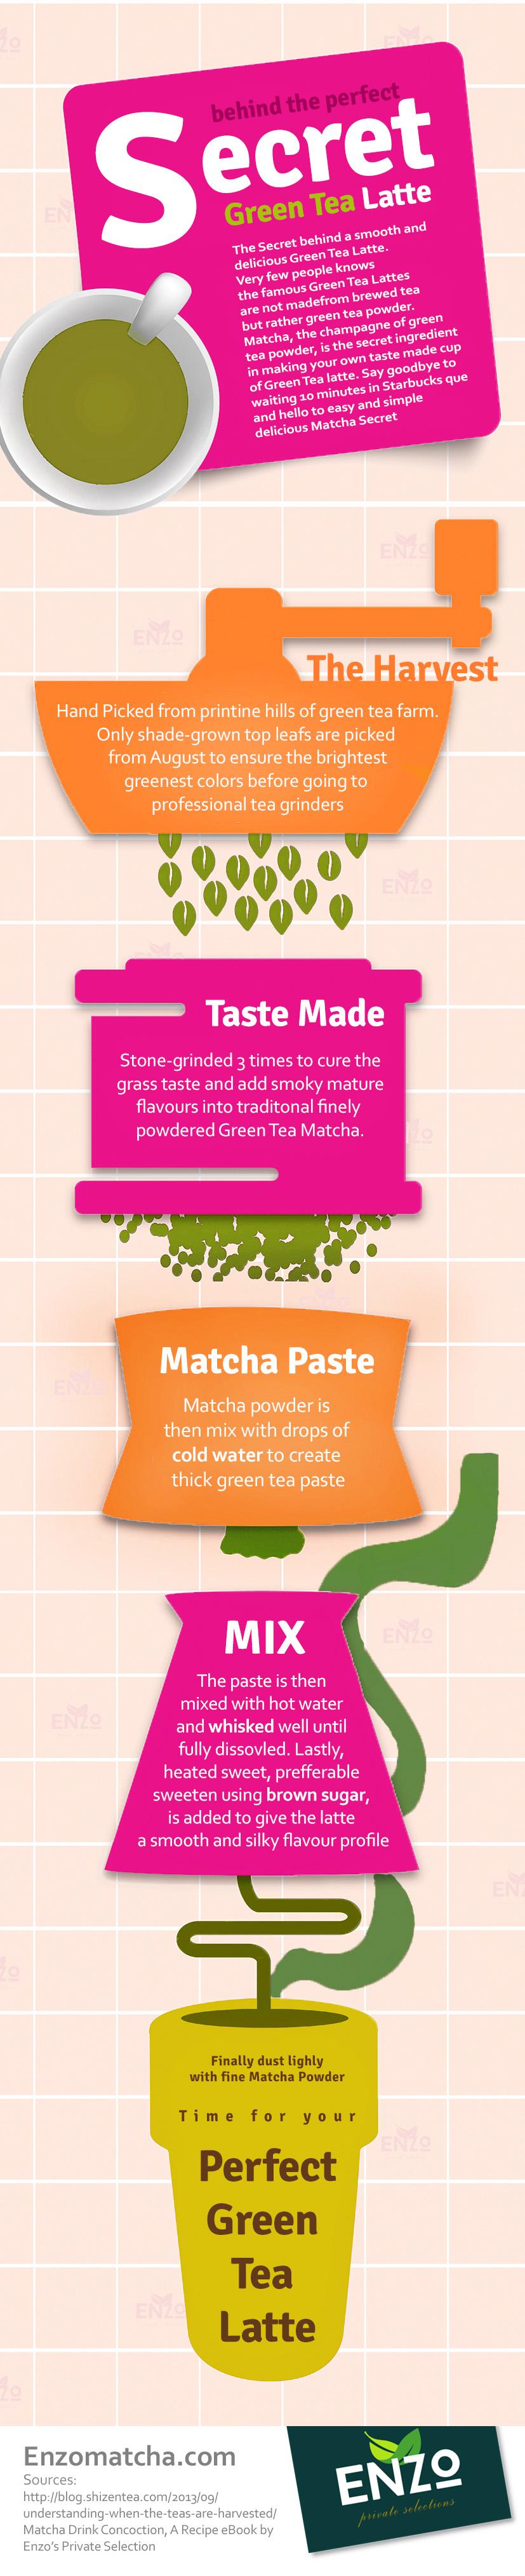 How make the Perfect Green Tea Latte Info